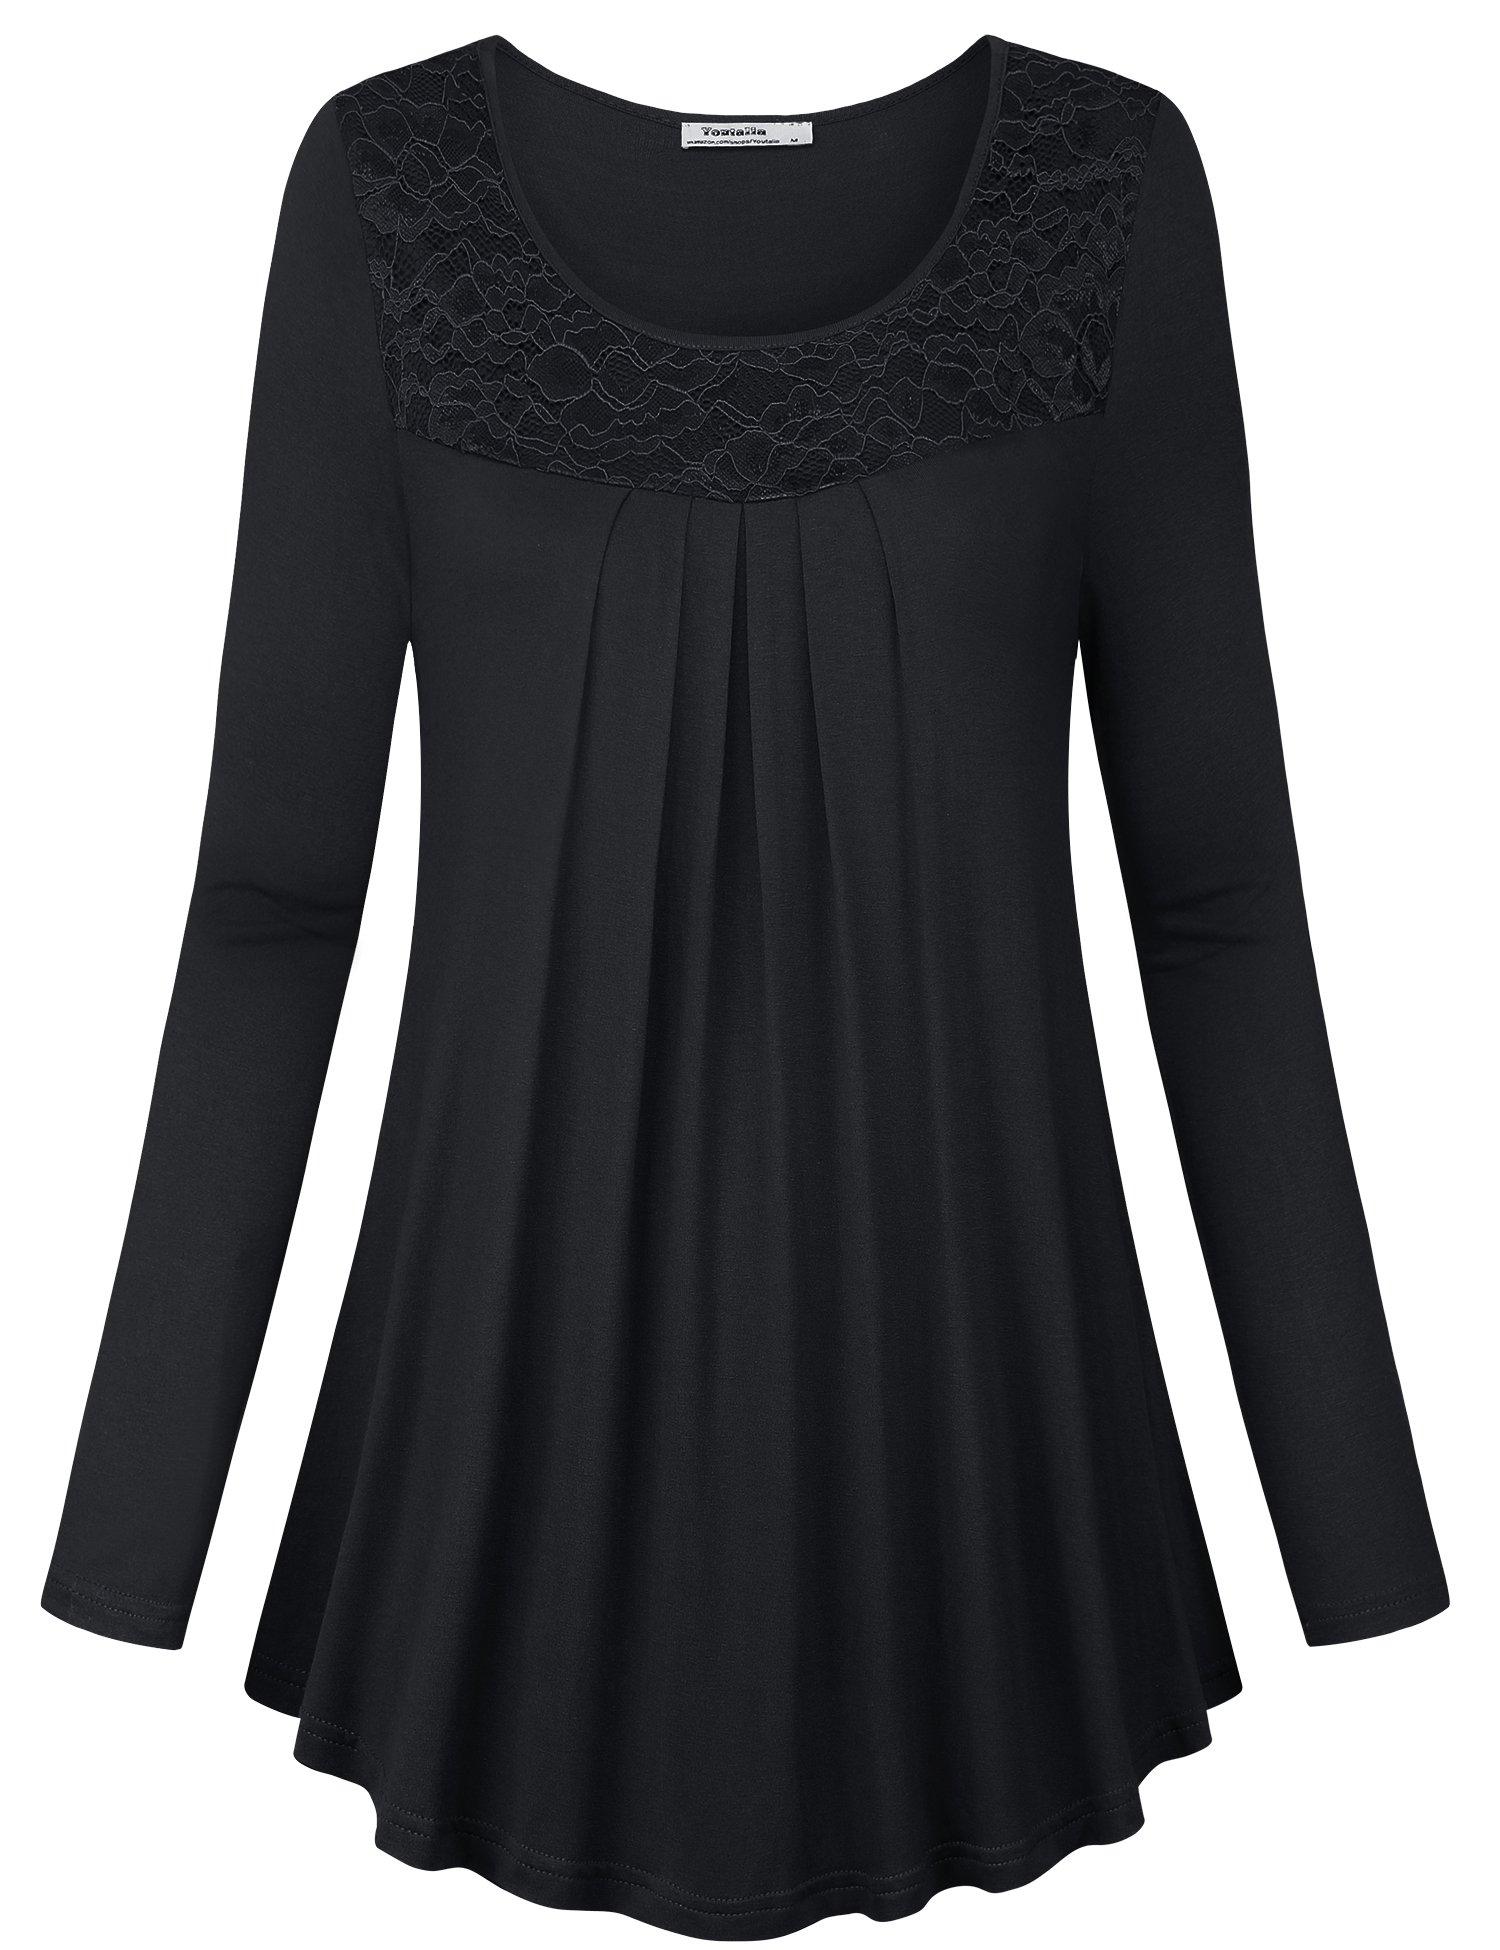 Youtalia Flowy Tops for Women, Ladies Stylish Long Sleeve Scoop Neck Curve Hem A Line Elastic Plus Size Elegant Lace Blouse Top,Black XX-Large